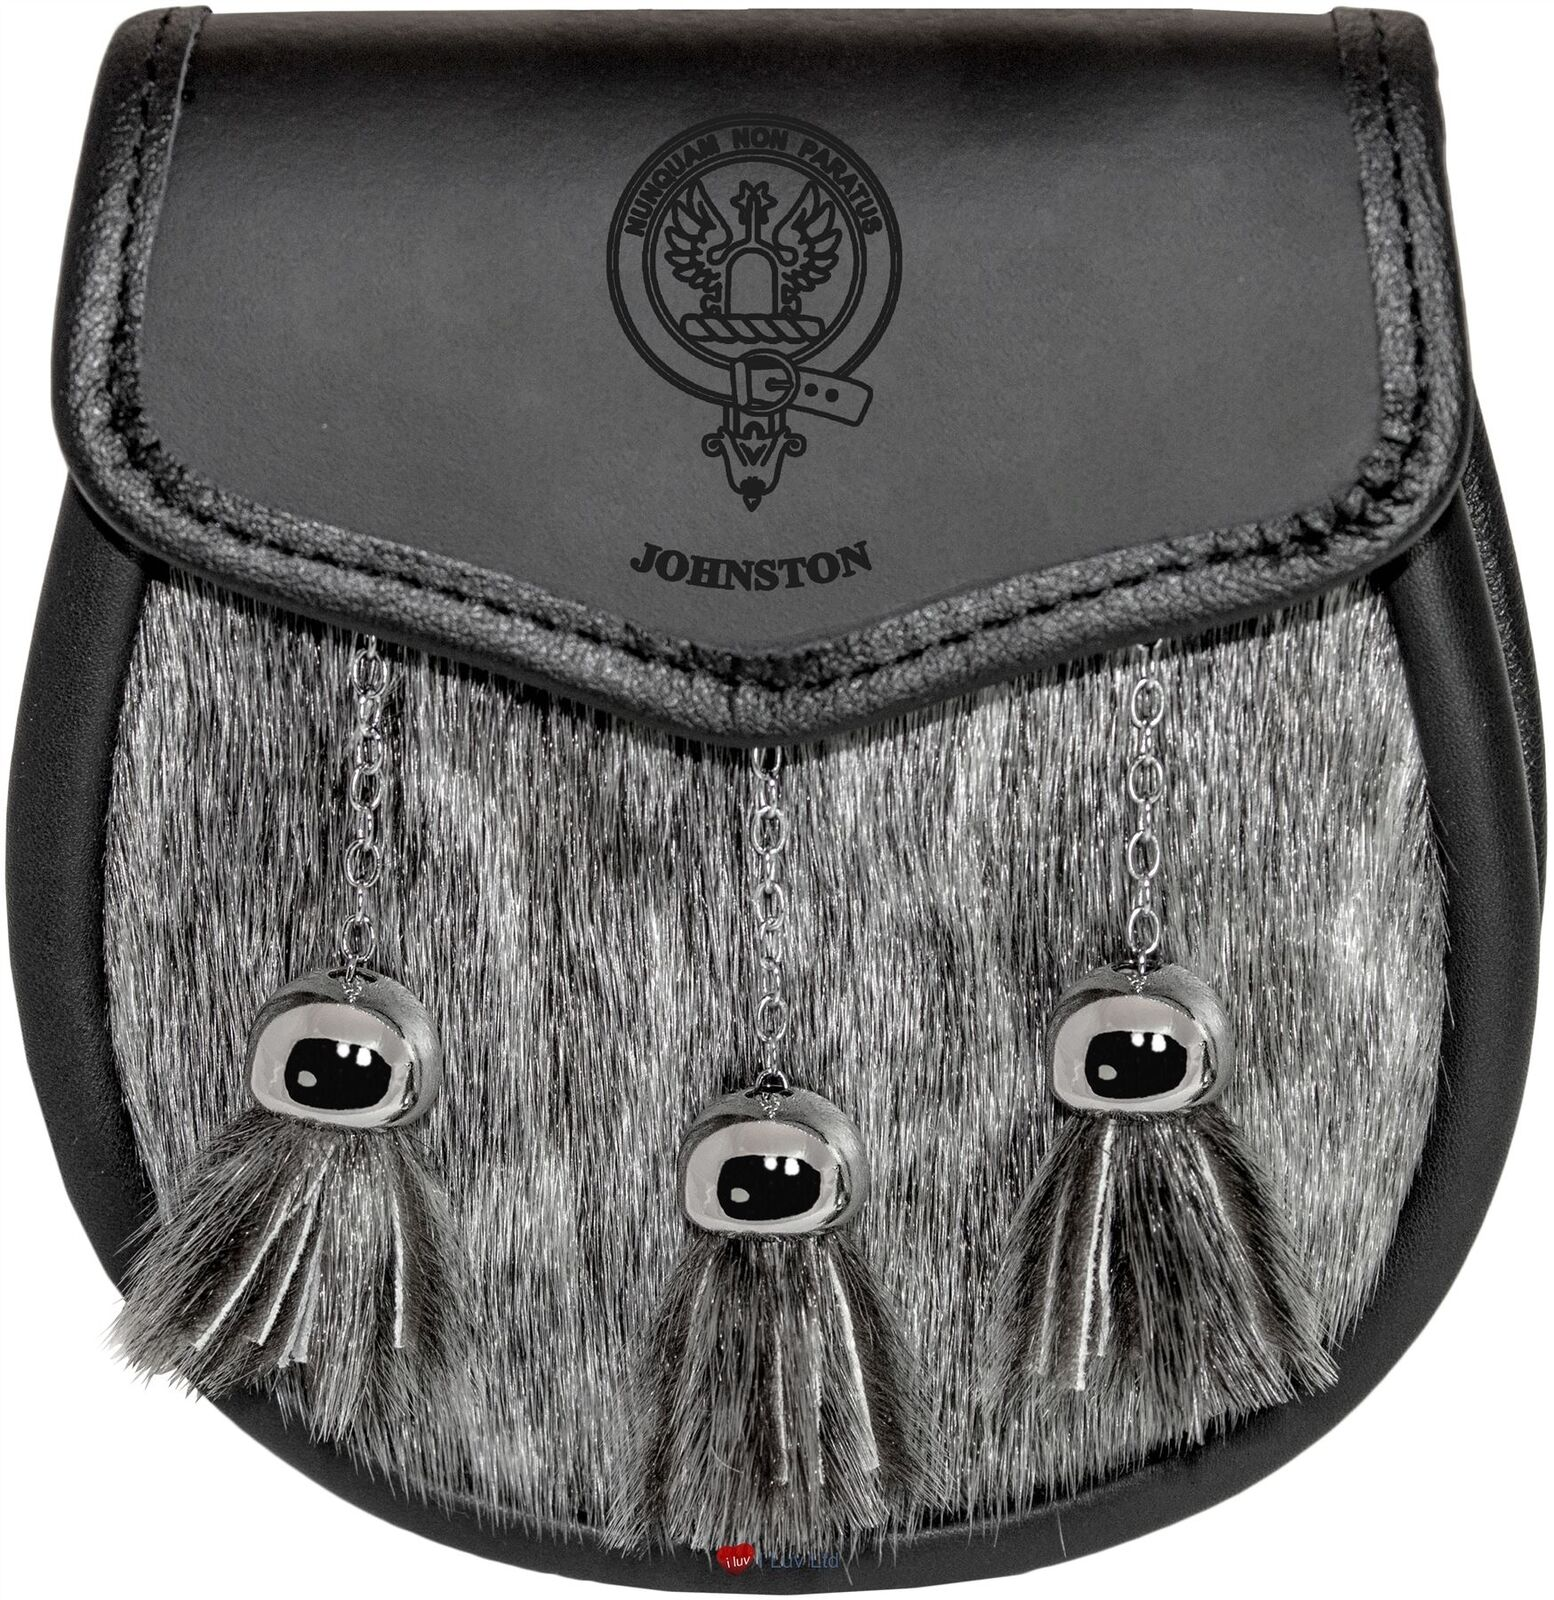 Johnston Semi Dress Sporran Fur Plain Leather Flap Scottish Clan Crest